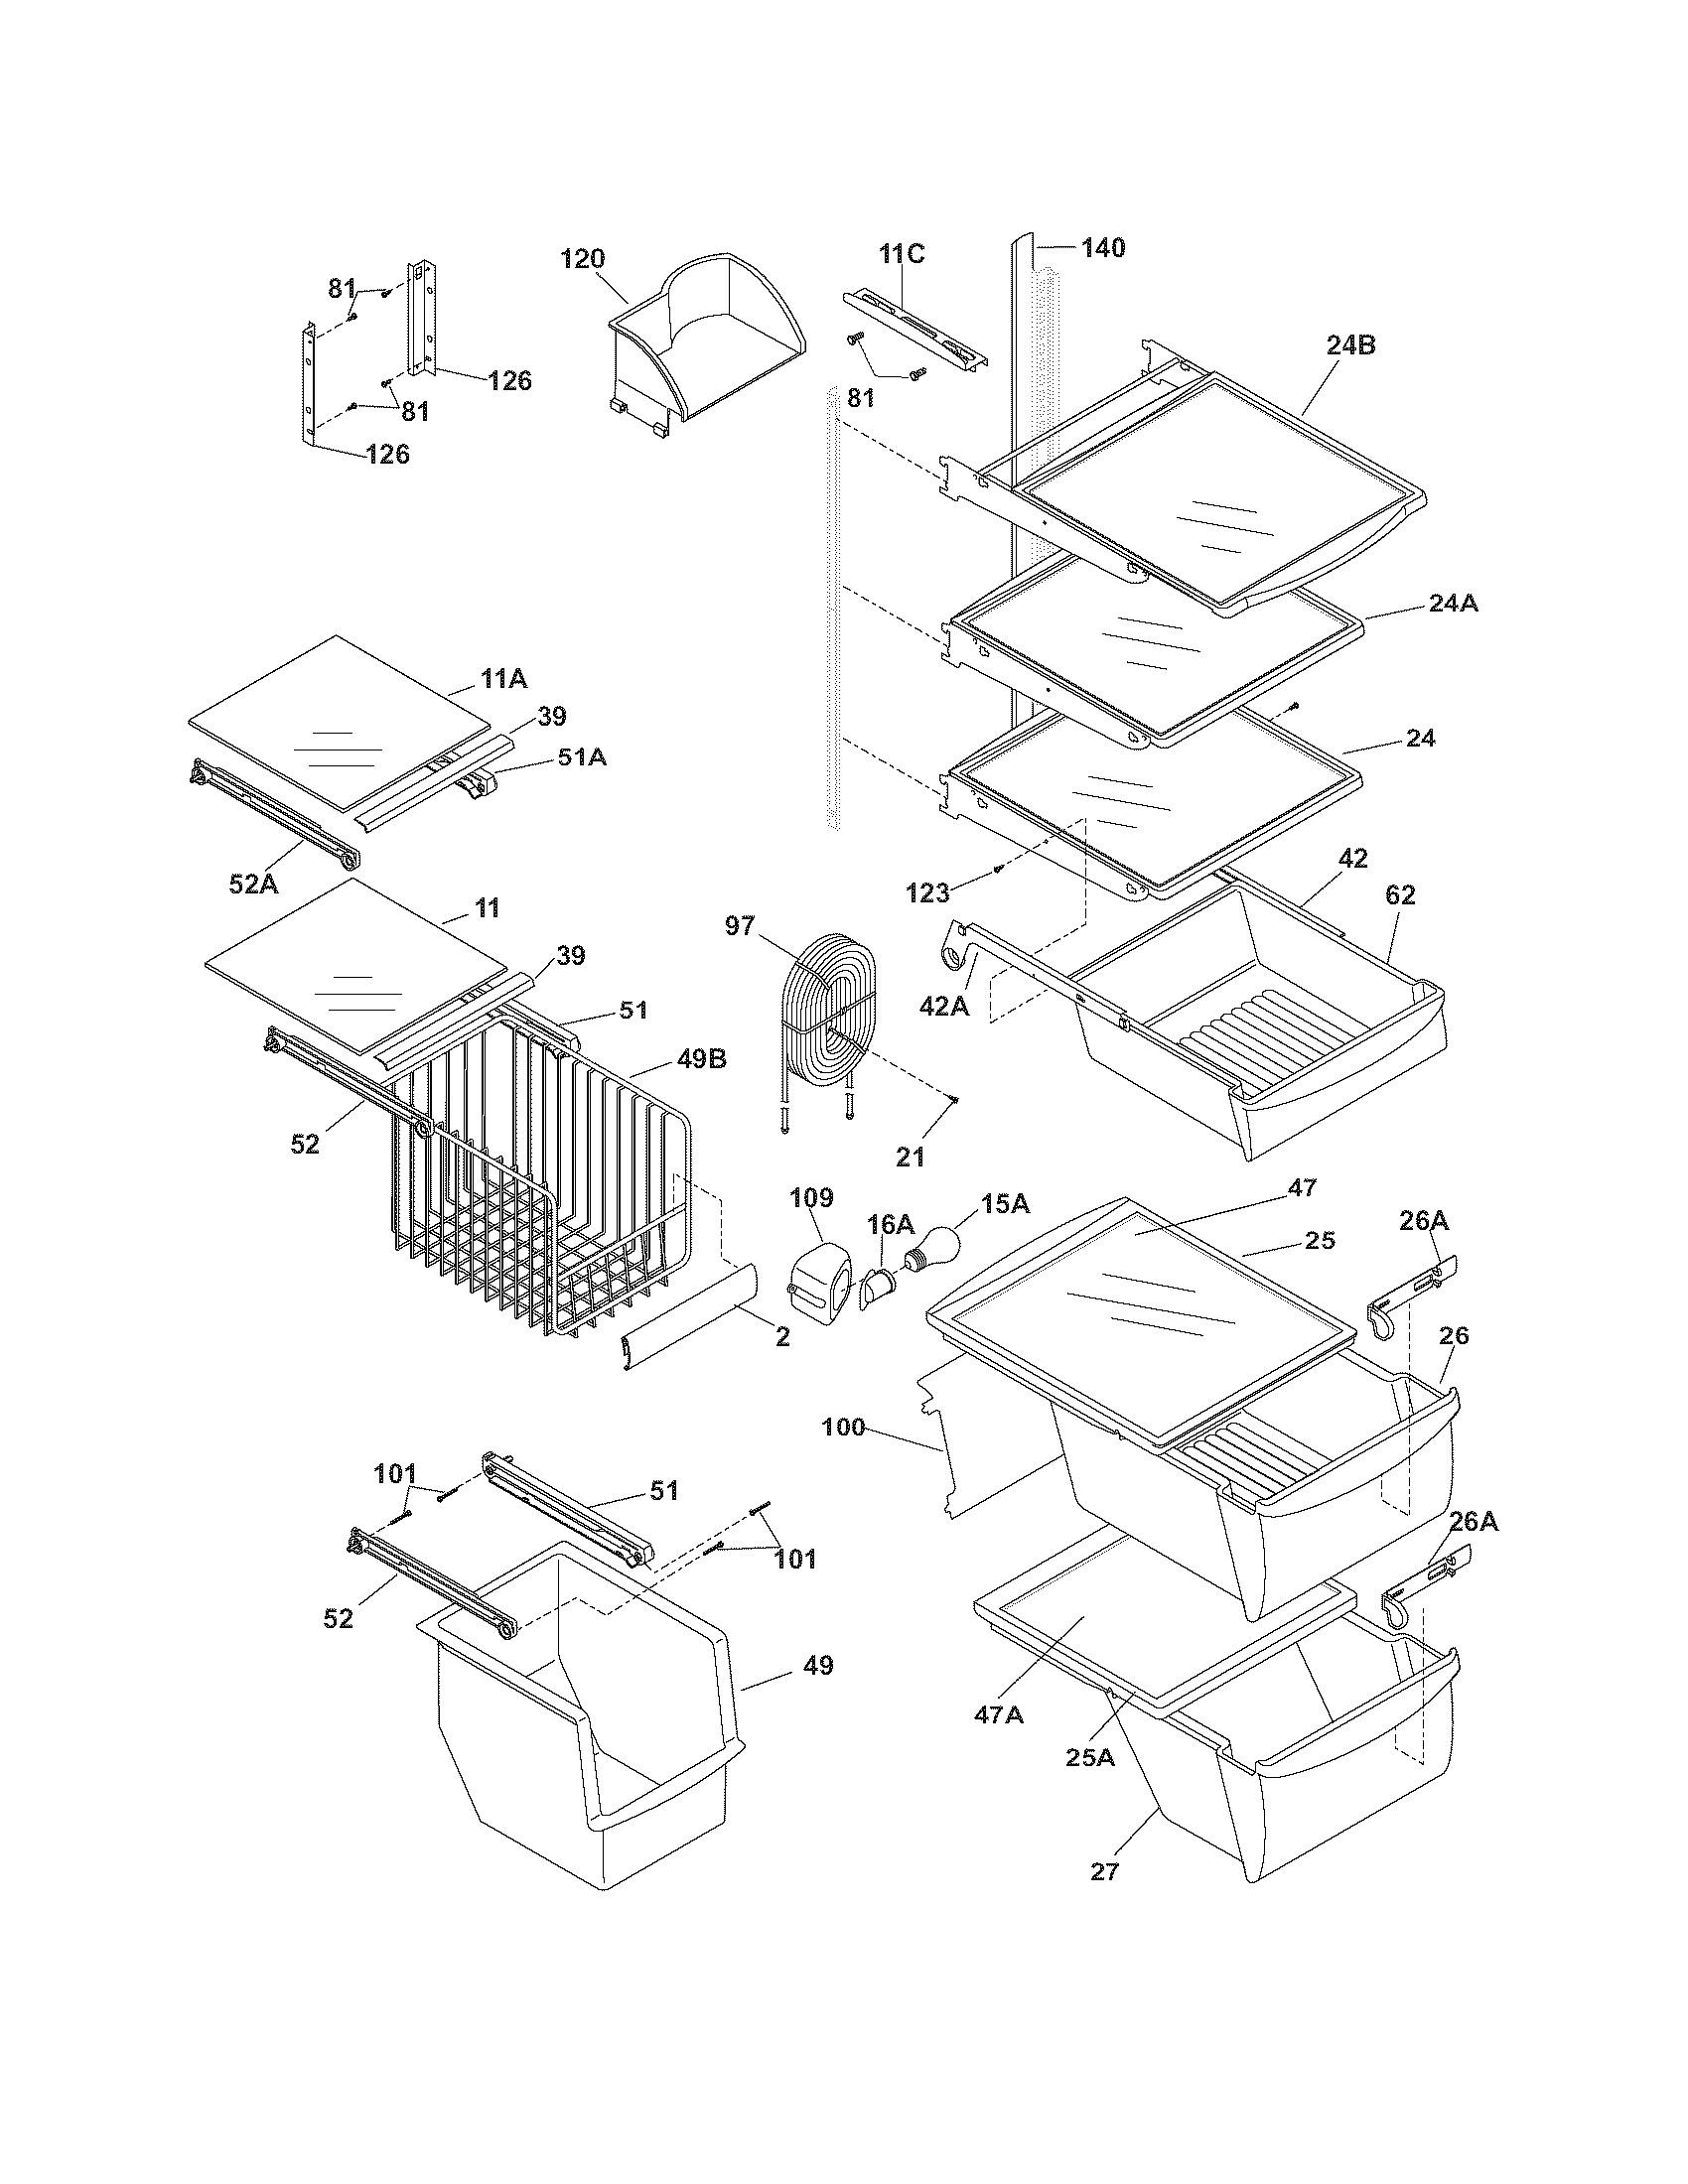 Frigidaire Gallery Refrigerator Parts Diagram Frigidaire Model Phs67ehsb6 Side by Side Refrigerator Genuine Parts Of Frigidaire Gallery Refrigerator Parts Diagram